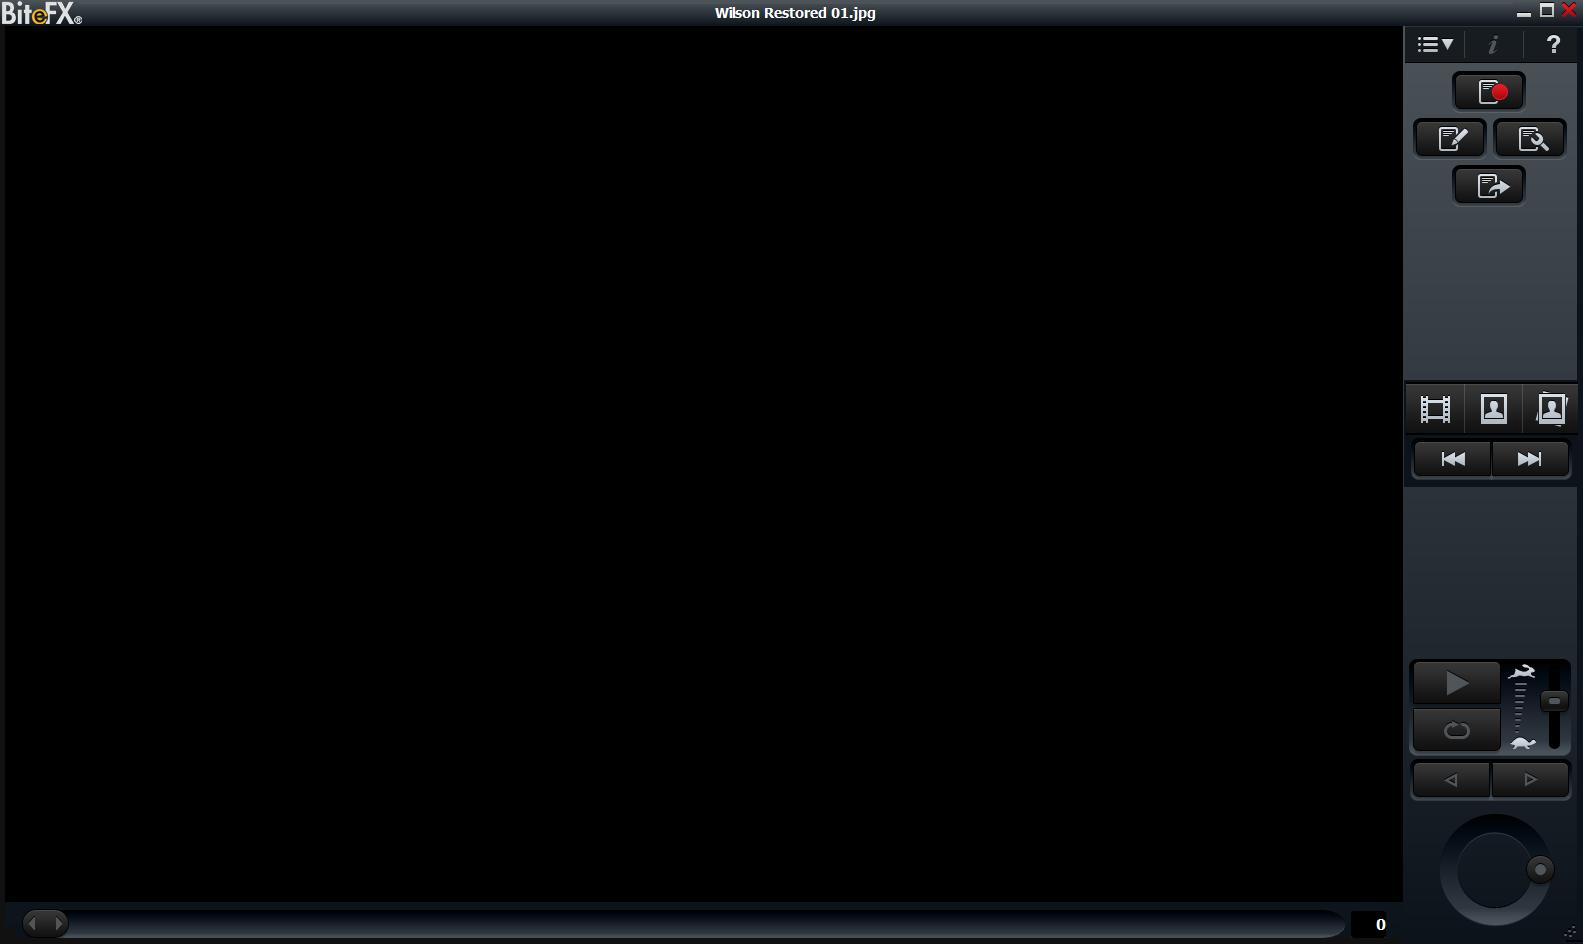 Black_Screen_Image_-_Wilson